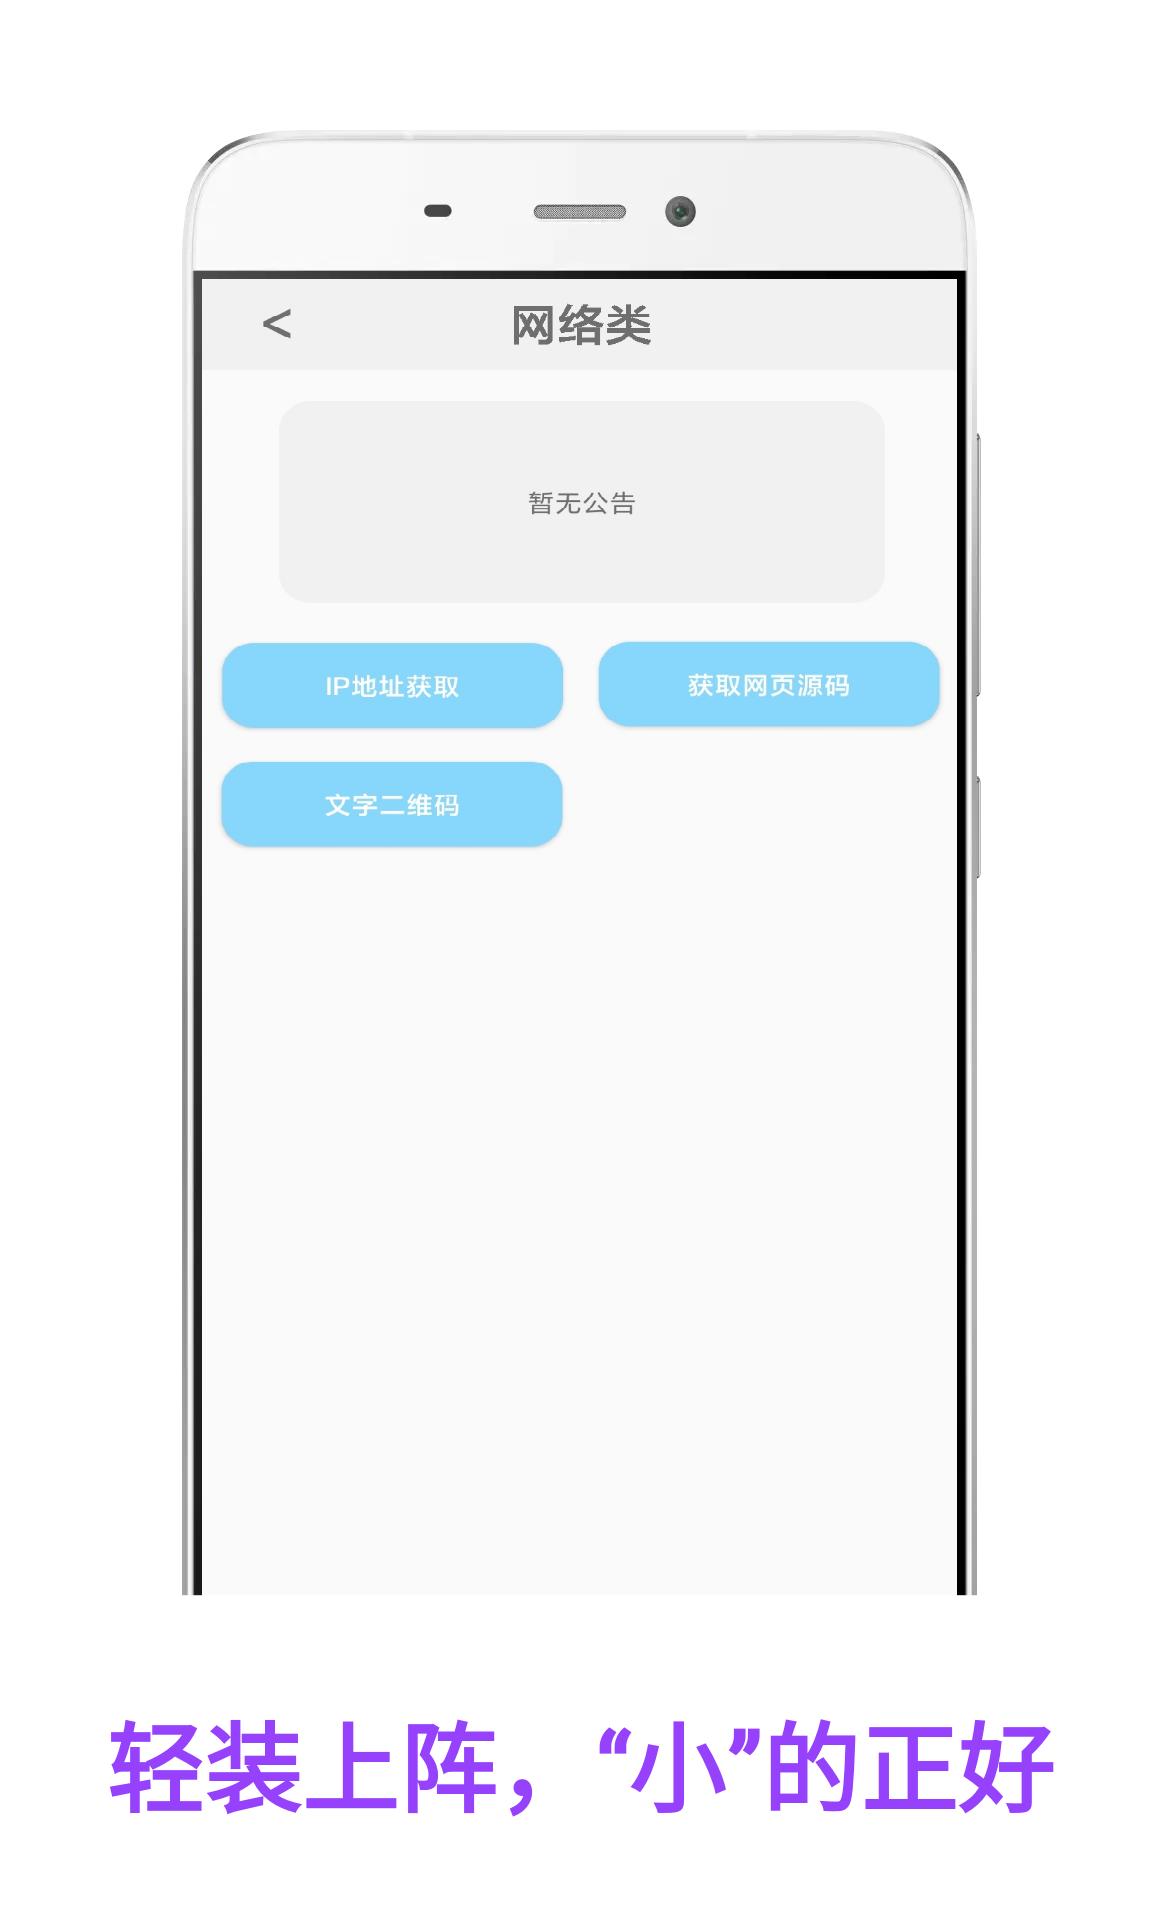 zio工具箱α0.0.3版本~